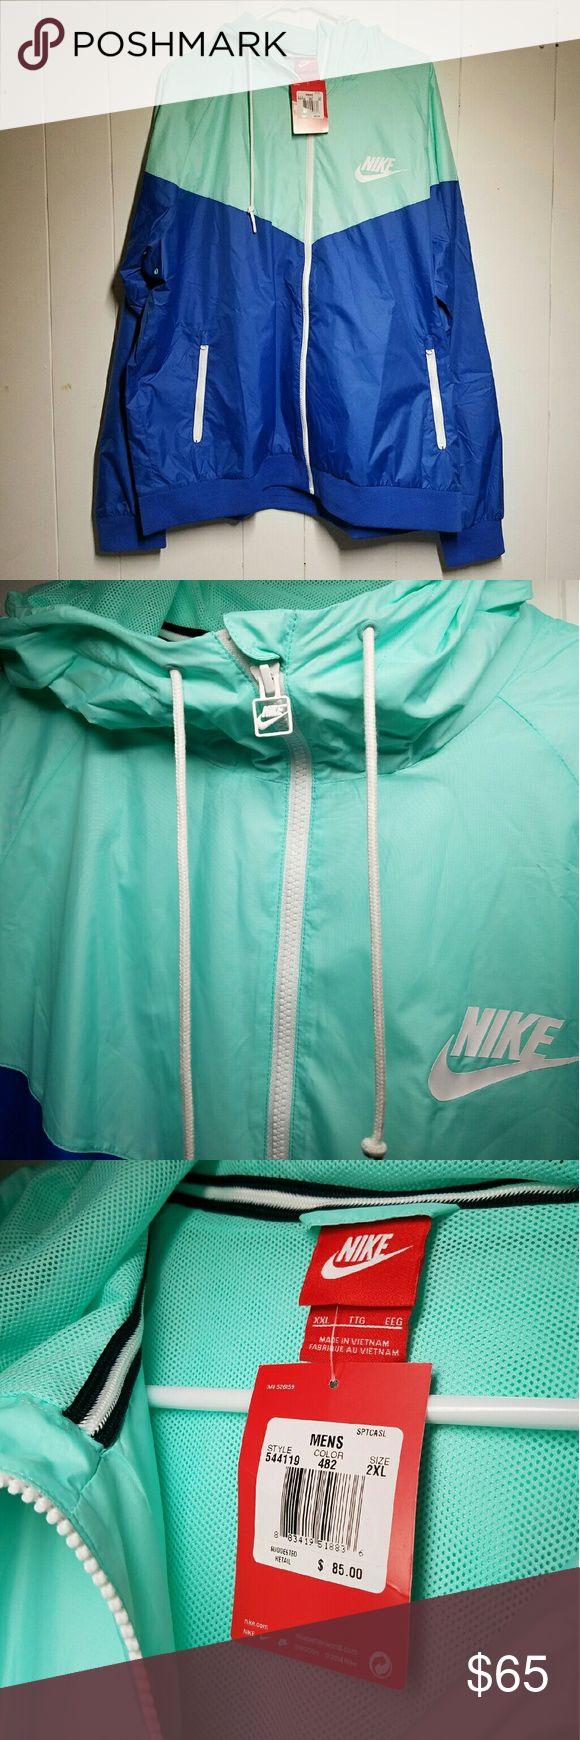 Nike Windrunner Jacket Blue + Teal Nike Windrunner Jacket Blue + Teal  -Brand new, never worn -comfortable fit Nike Jackets & Coats Windbreakers